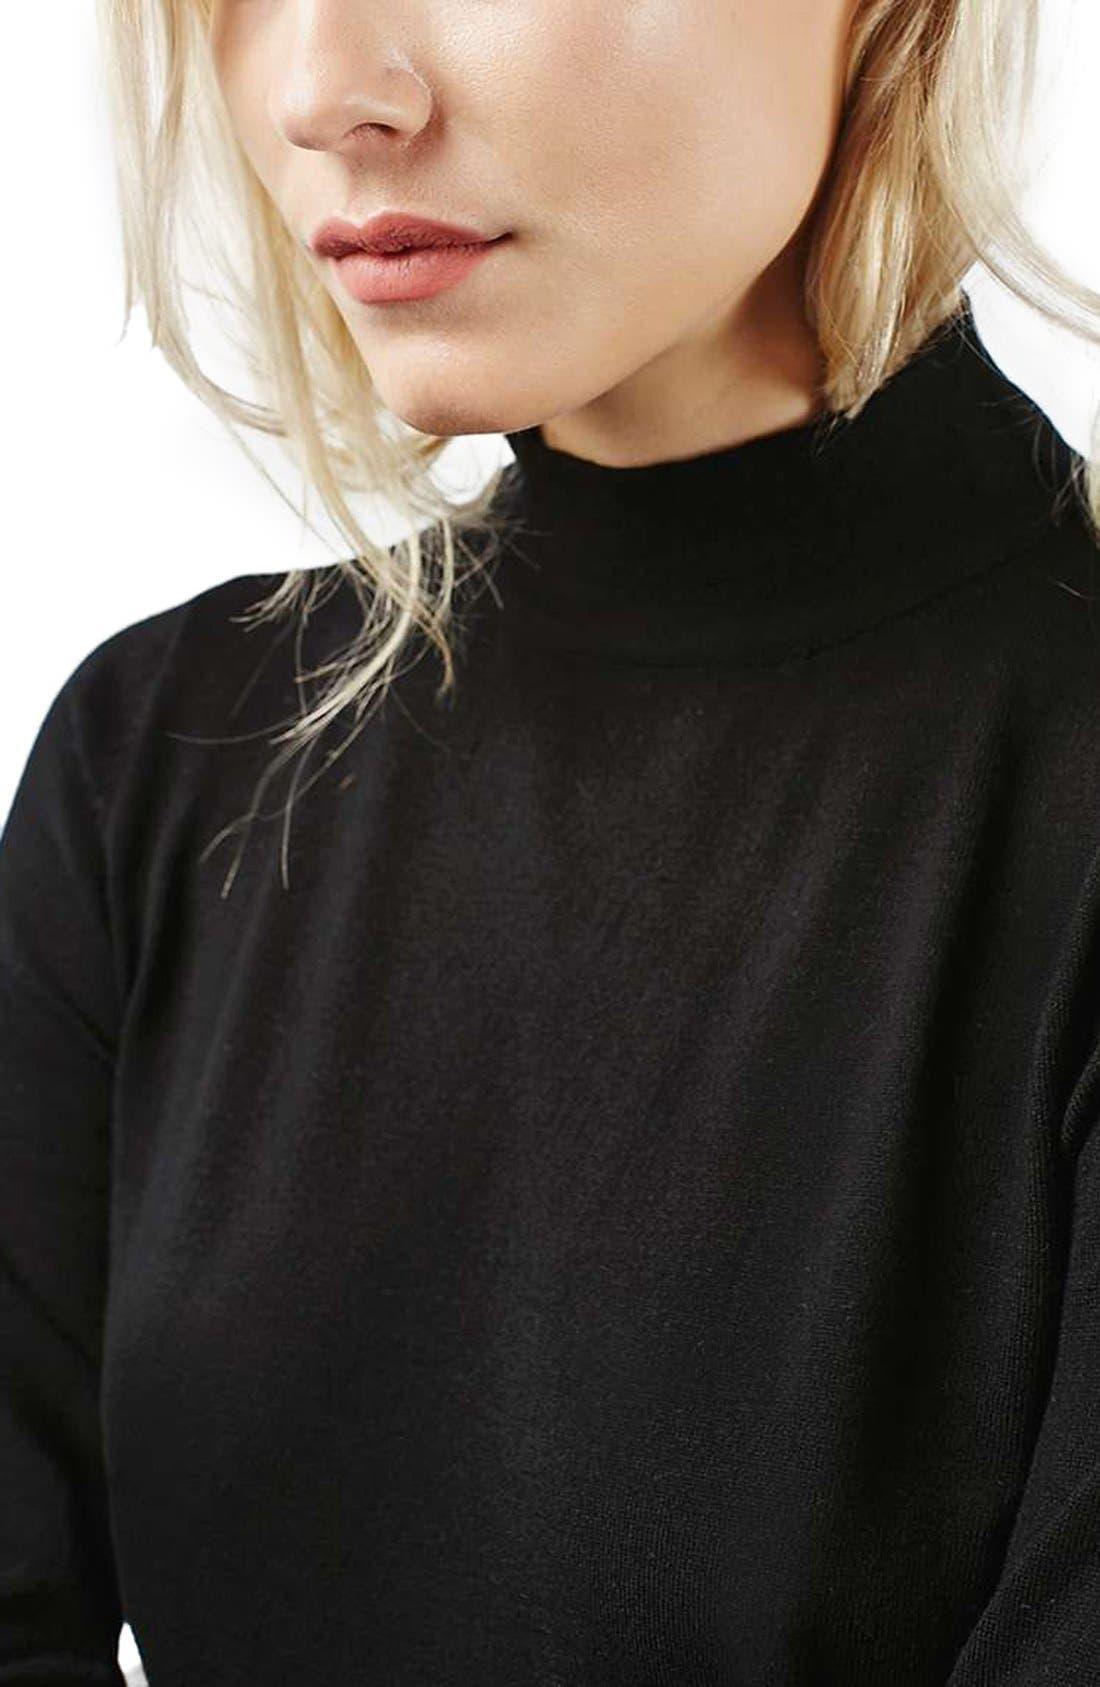 TOPSHOP, Blouson Sleeve Mock Neck Sweater, Alternate thumbnail 5, color, 001